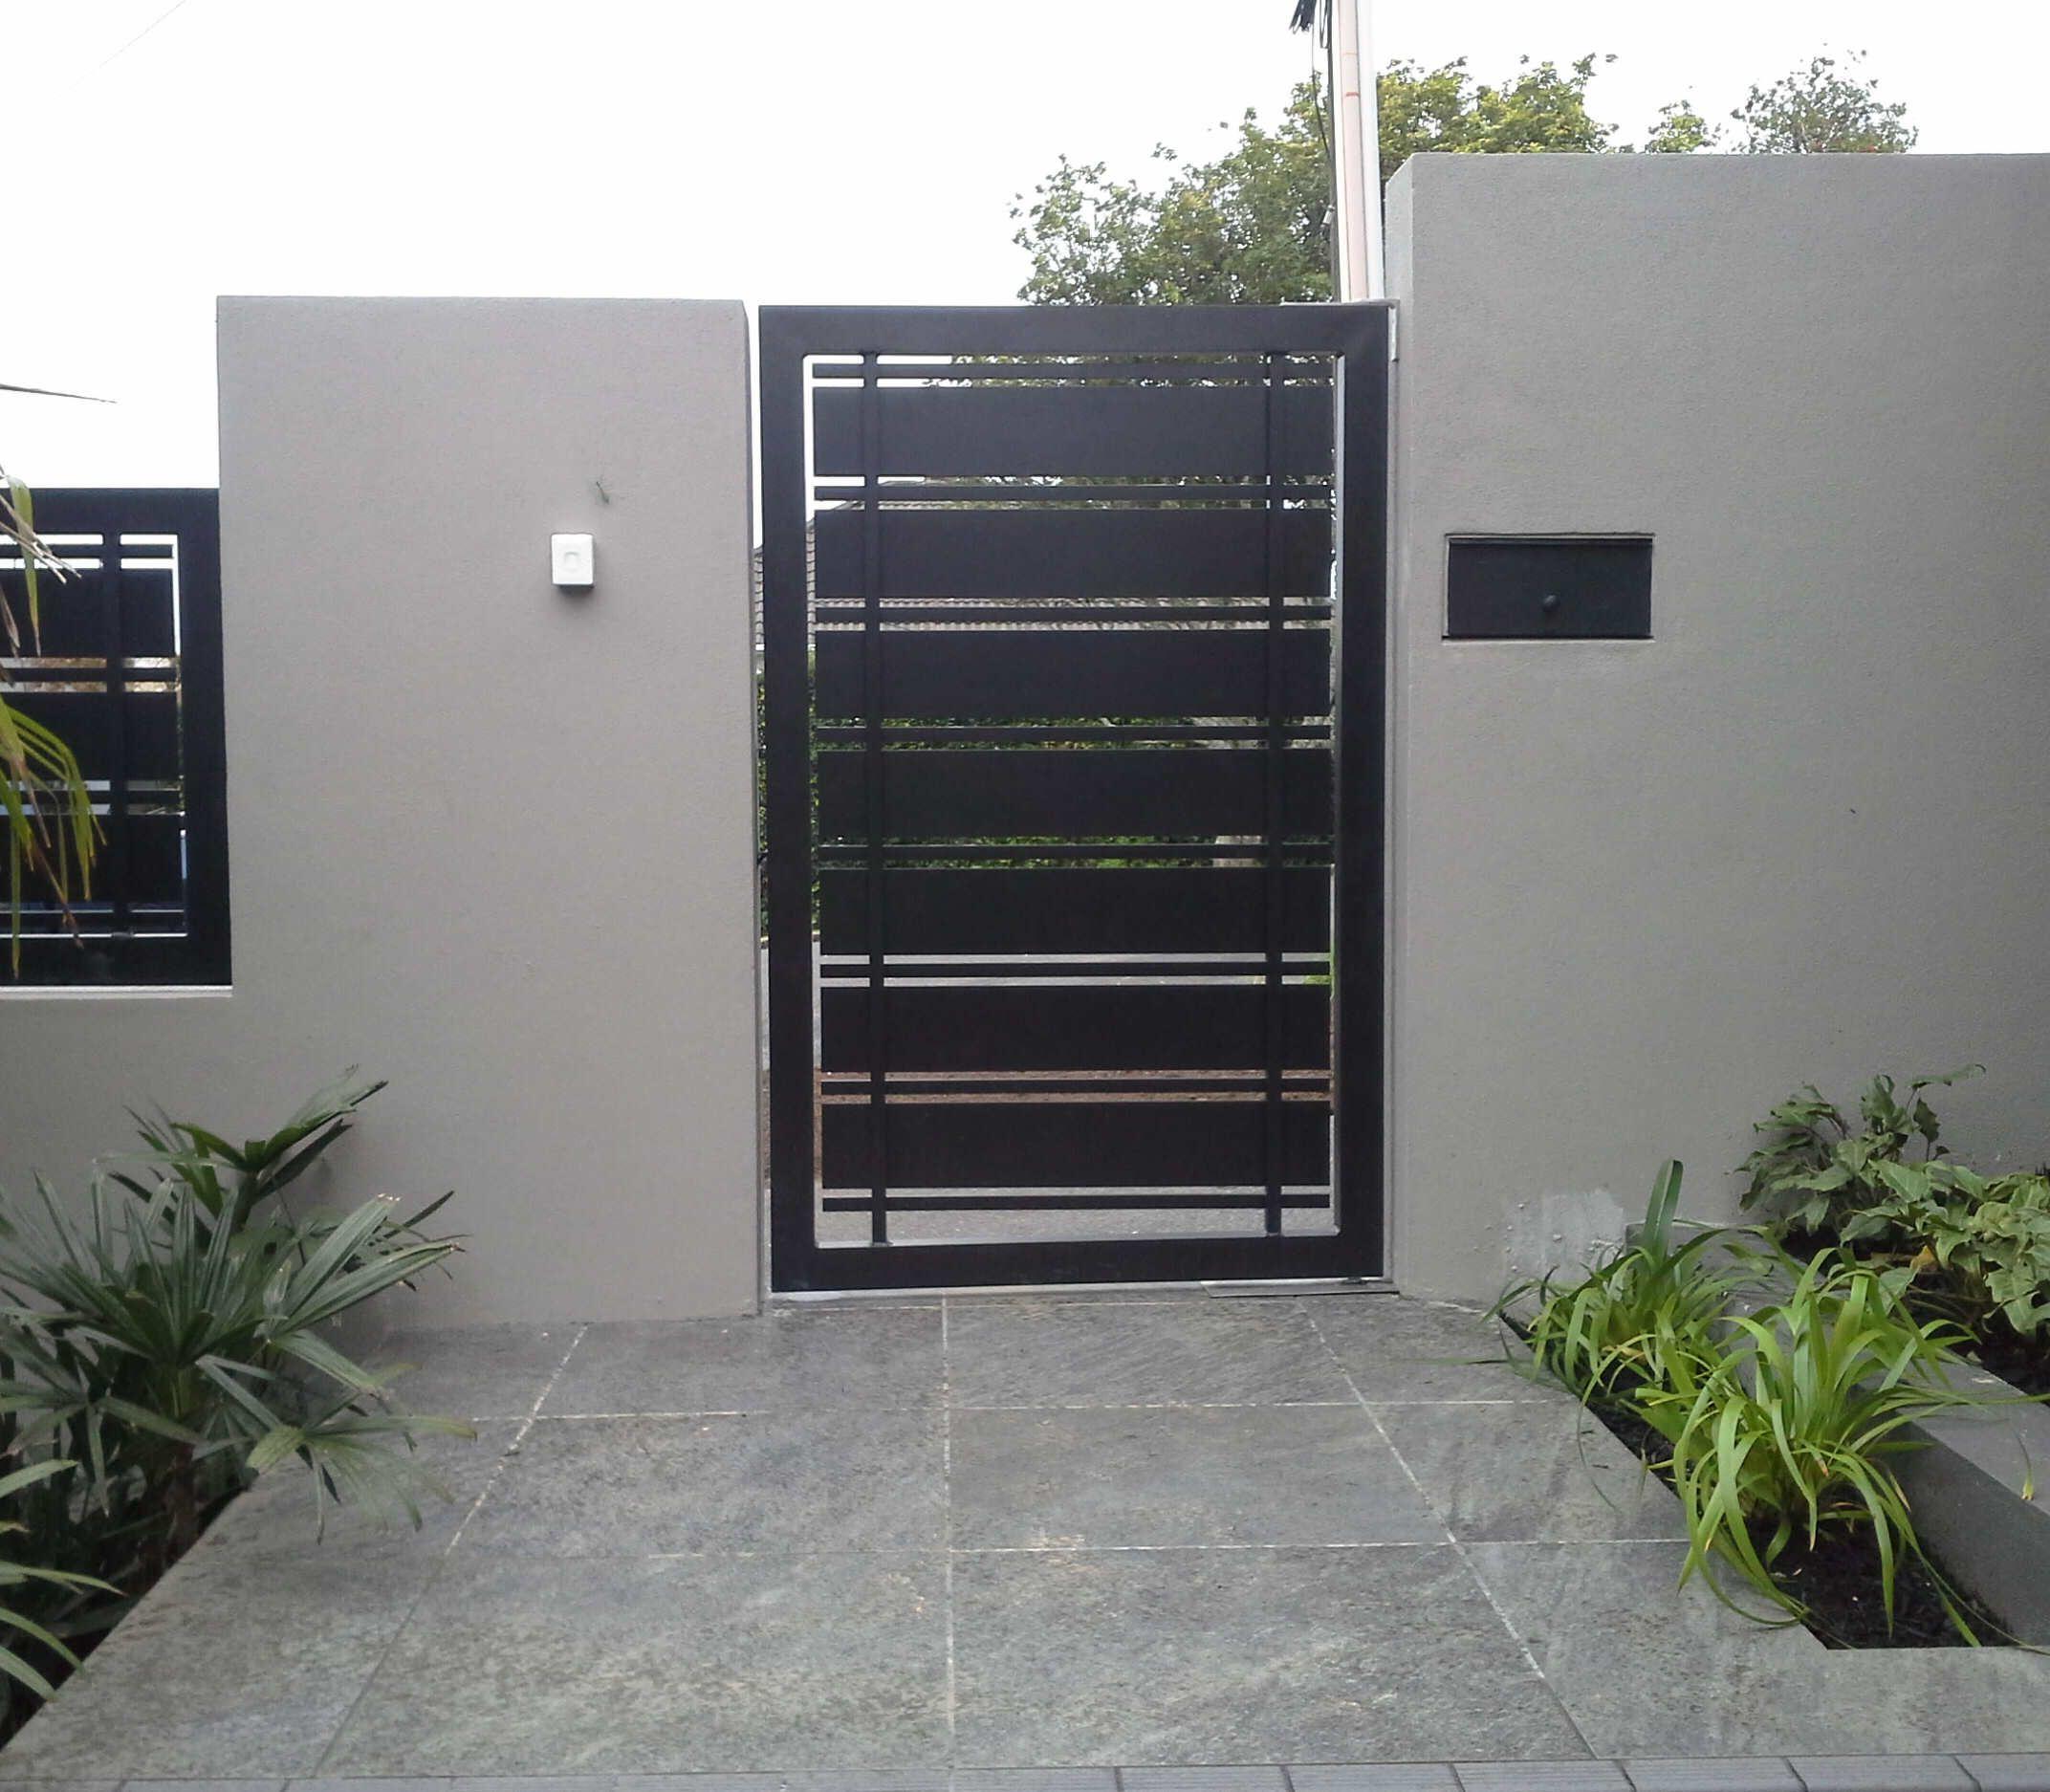 pingl par audrey kippen sur house n home pinterest. Black Bedroom Furniture Sets. Home Design Ideas